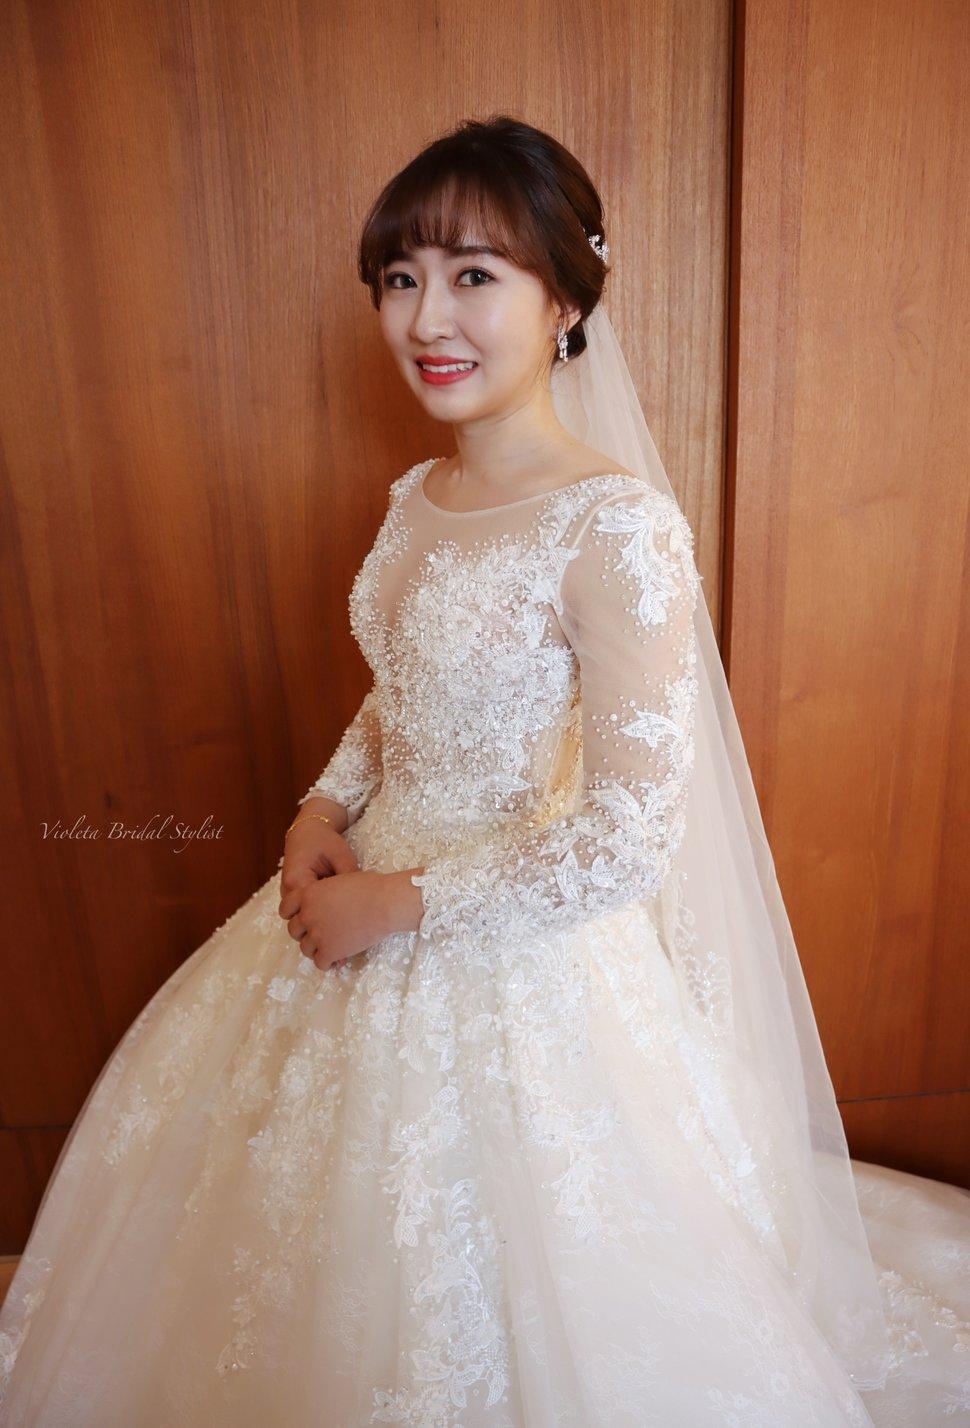 382D5EA4-AAB5-453F-8413-ECE7EE62038D - 台中/台南新秘可可 新娘精緻彩妝整體造型《結婚吧》